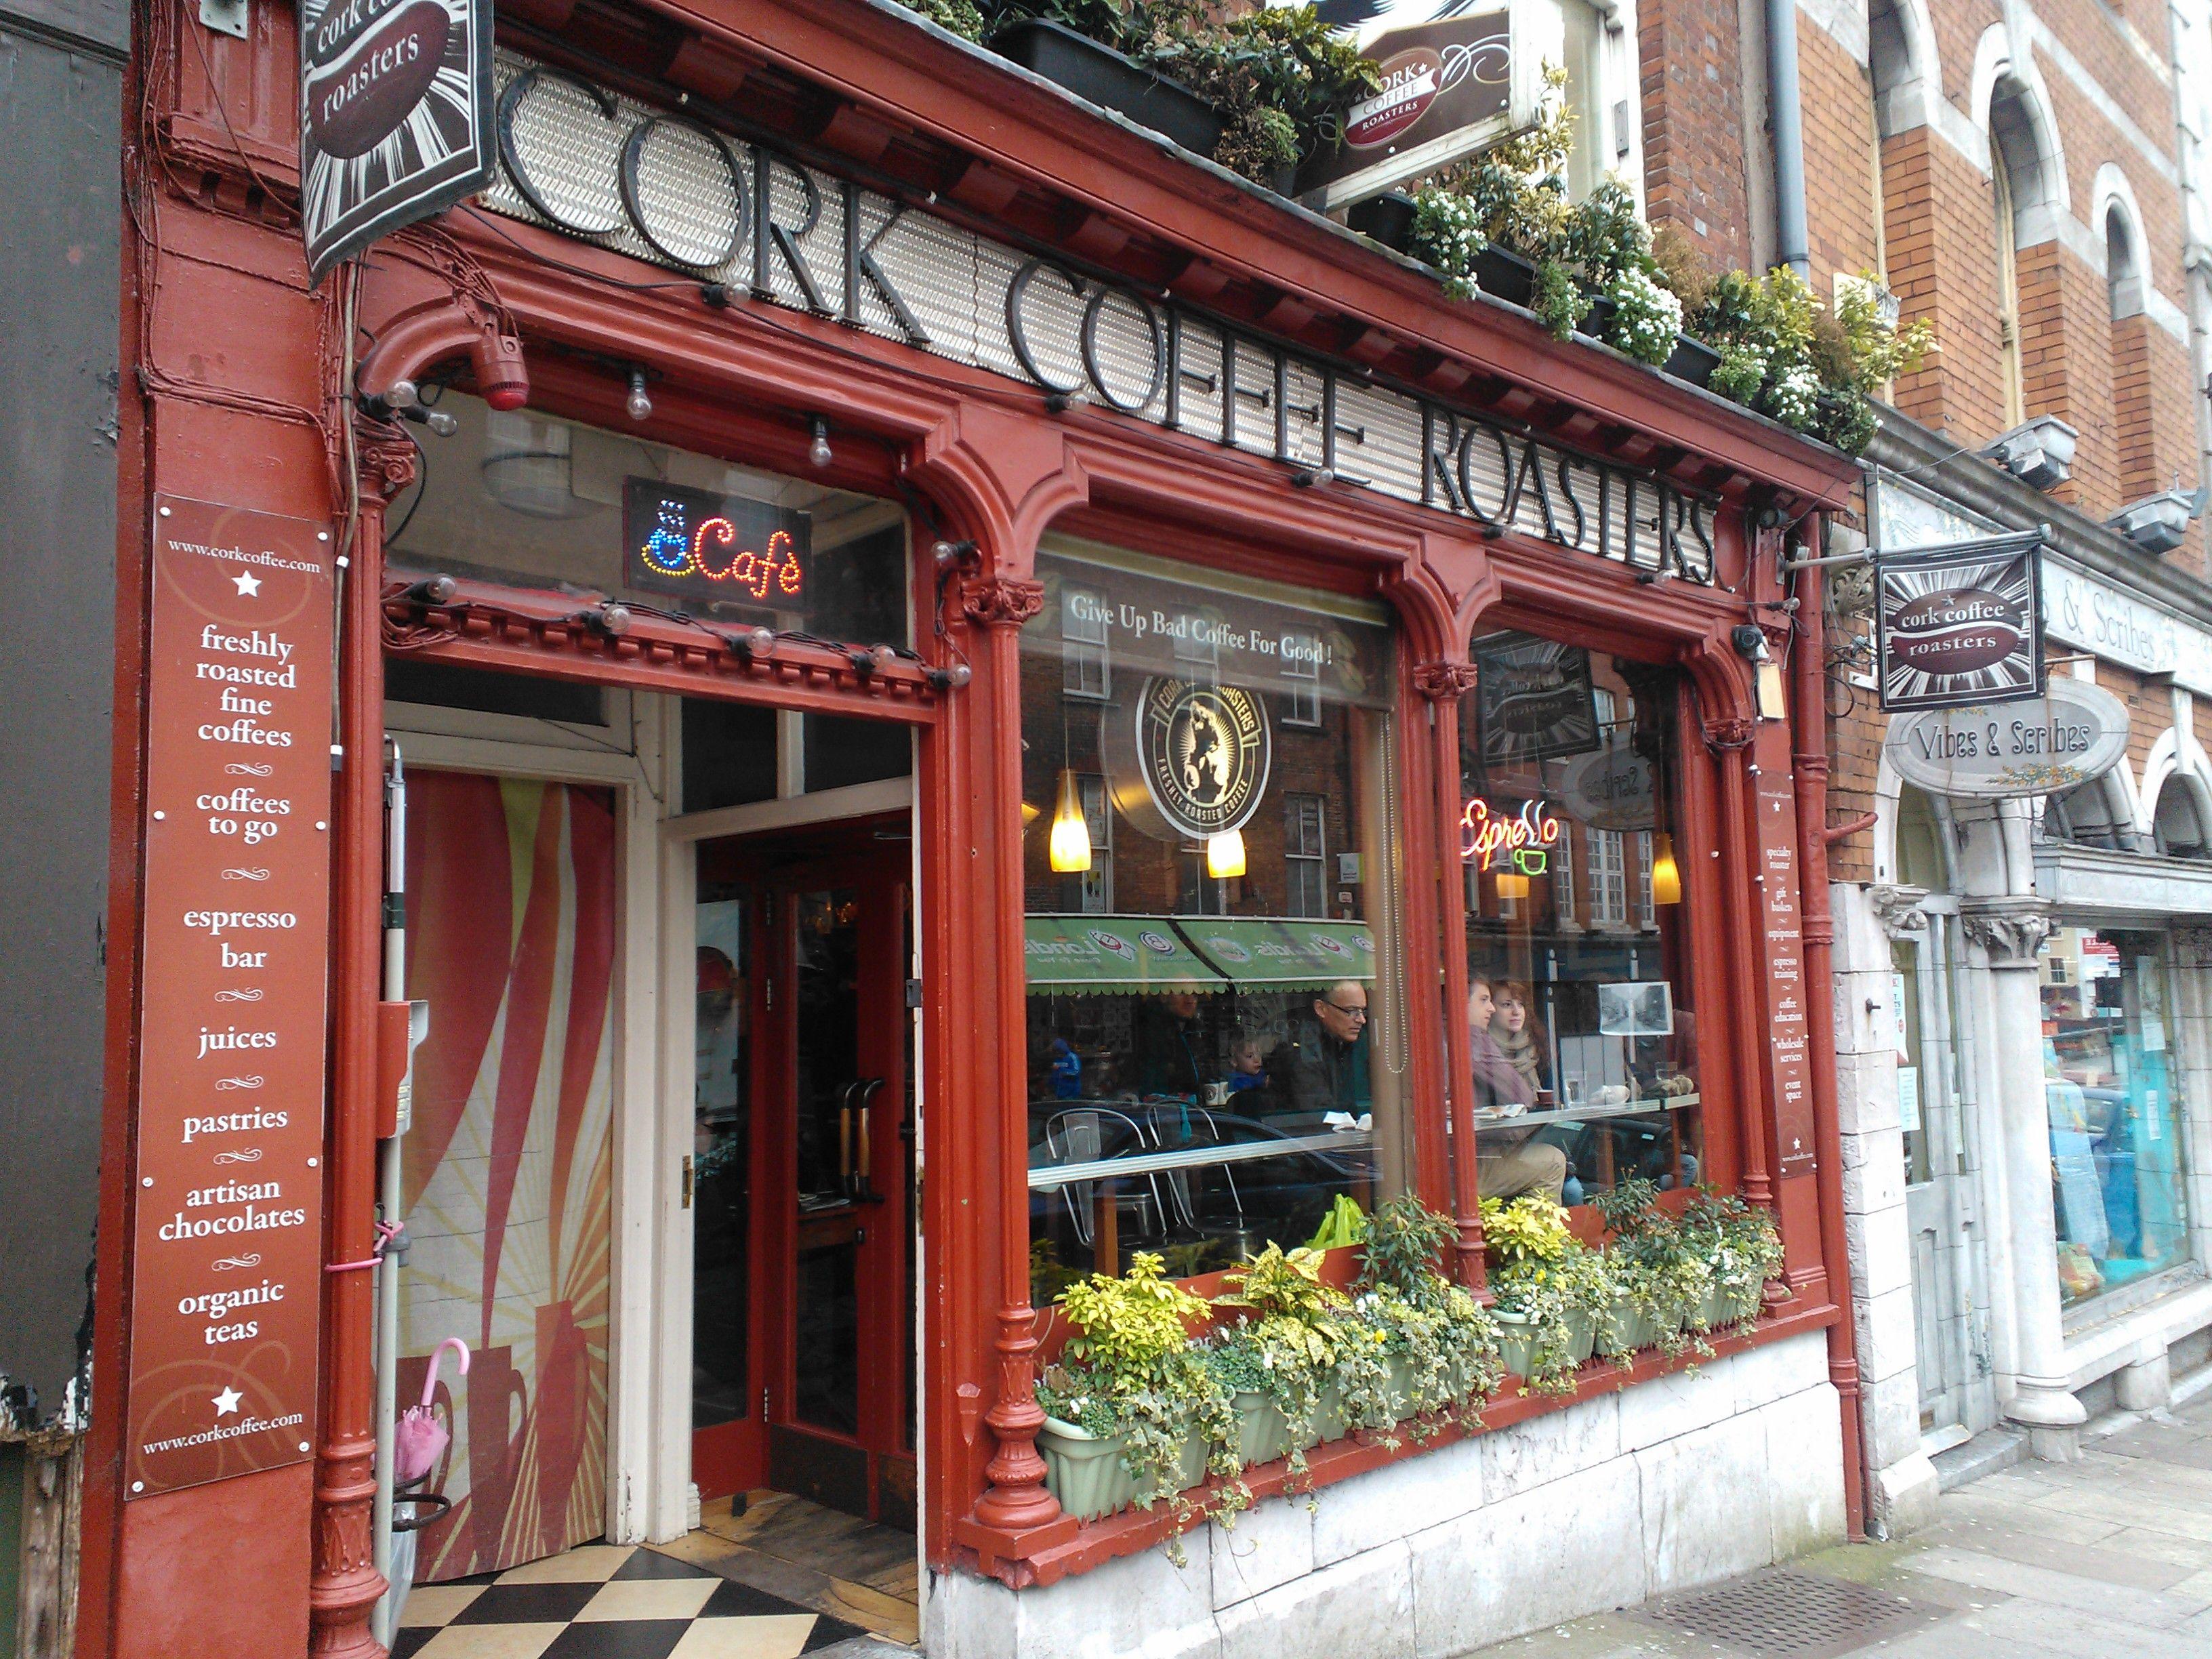 cork coffee roasters, mccartney street, ireland. damn good coffee